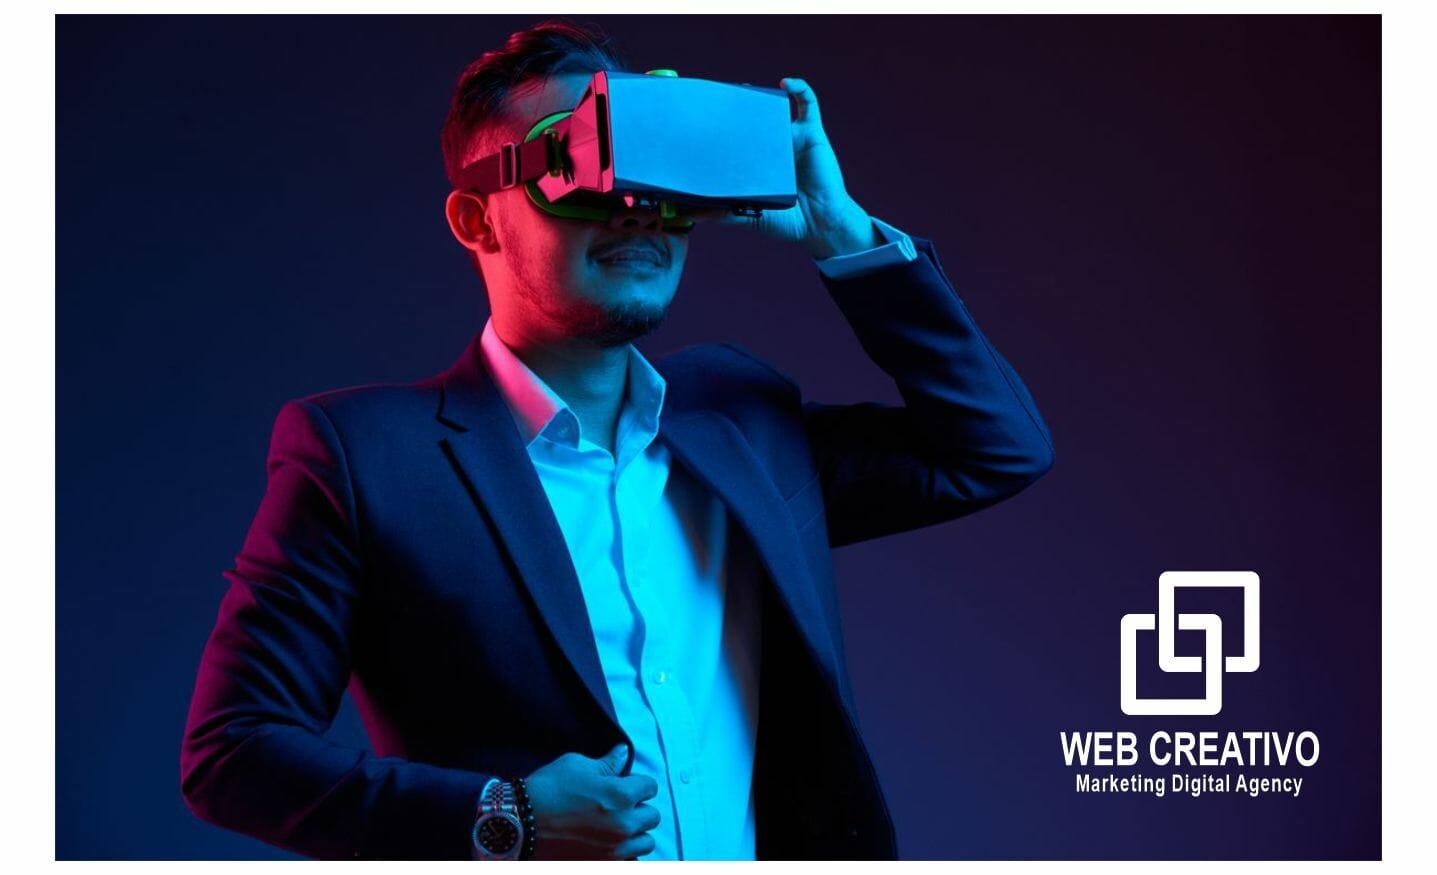 WEB CREATIVO_REALIDAD VIRTUAL 3D